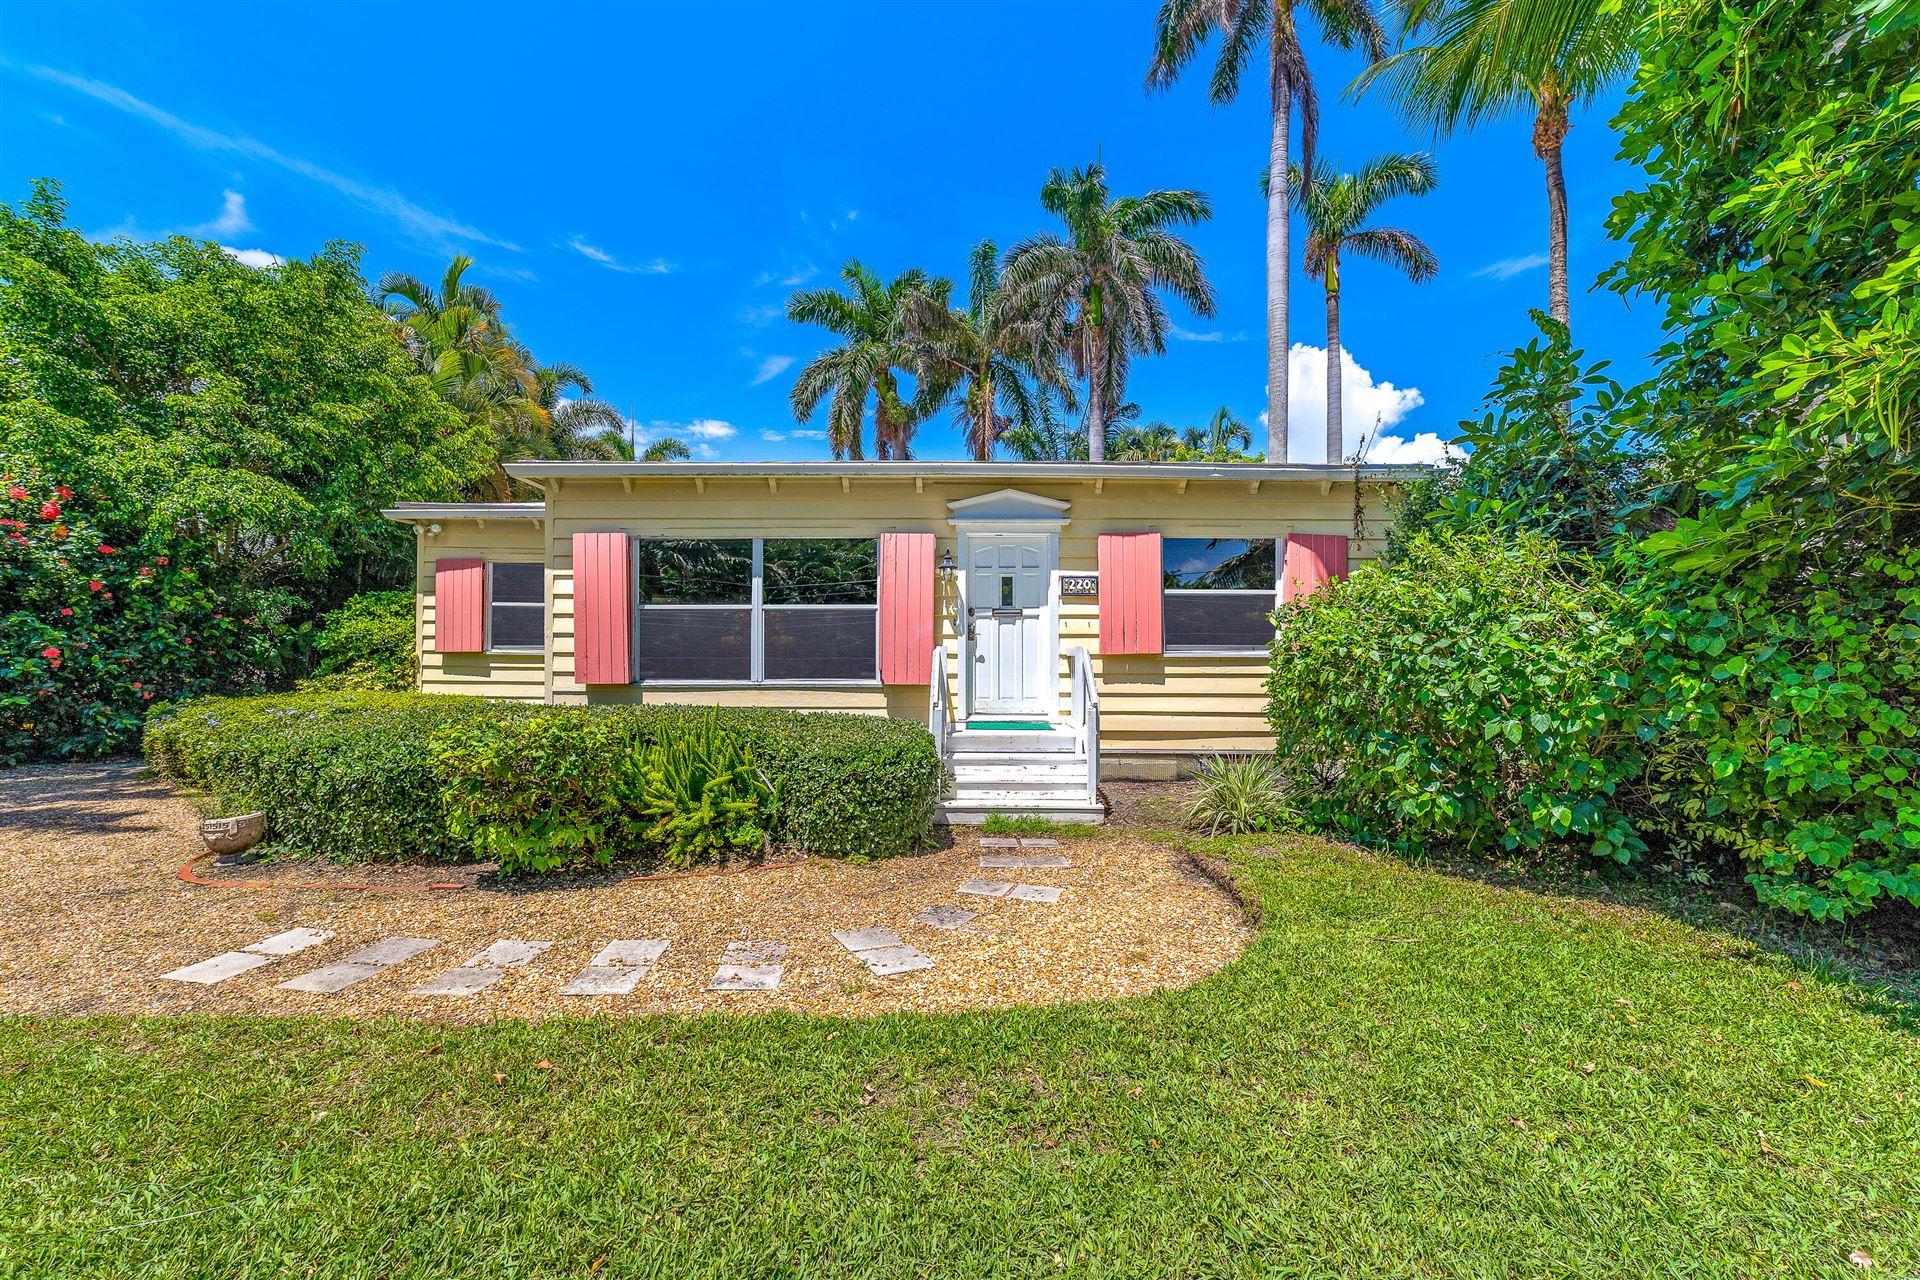 220 Andrews Avenue, Delray Beach, FL 33483 - MLS#: RX-10738197